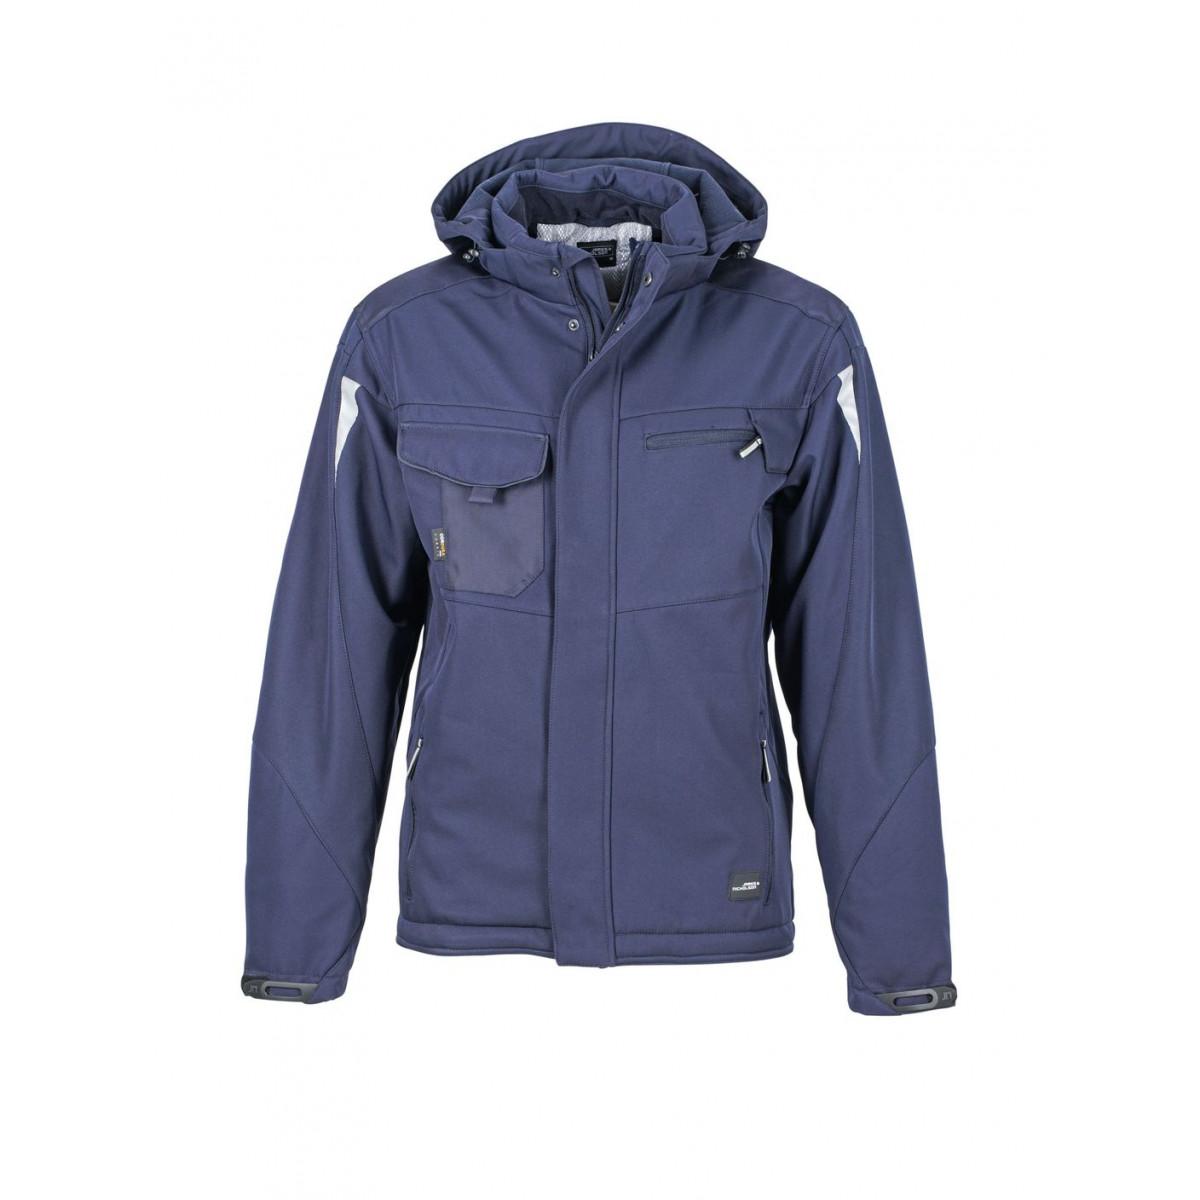 Куртка мужская JN824 Craftsmen Softshell Jacket - Темно-синий/Темно-синий